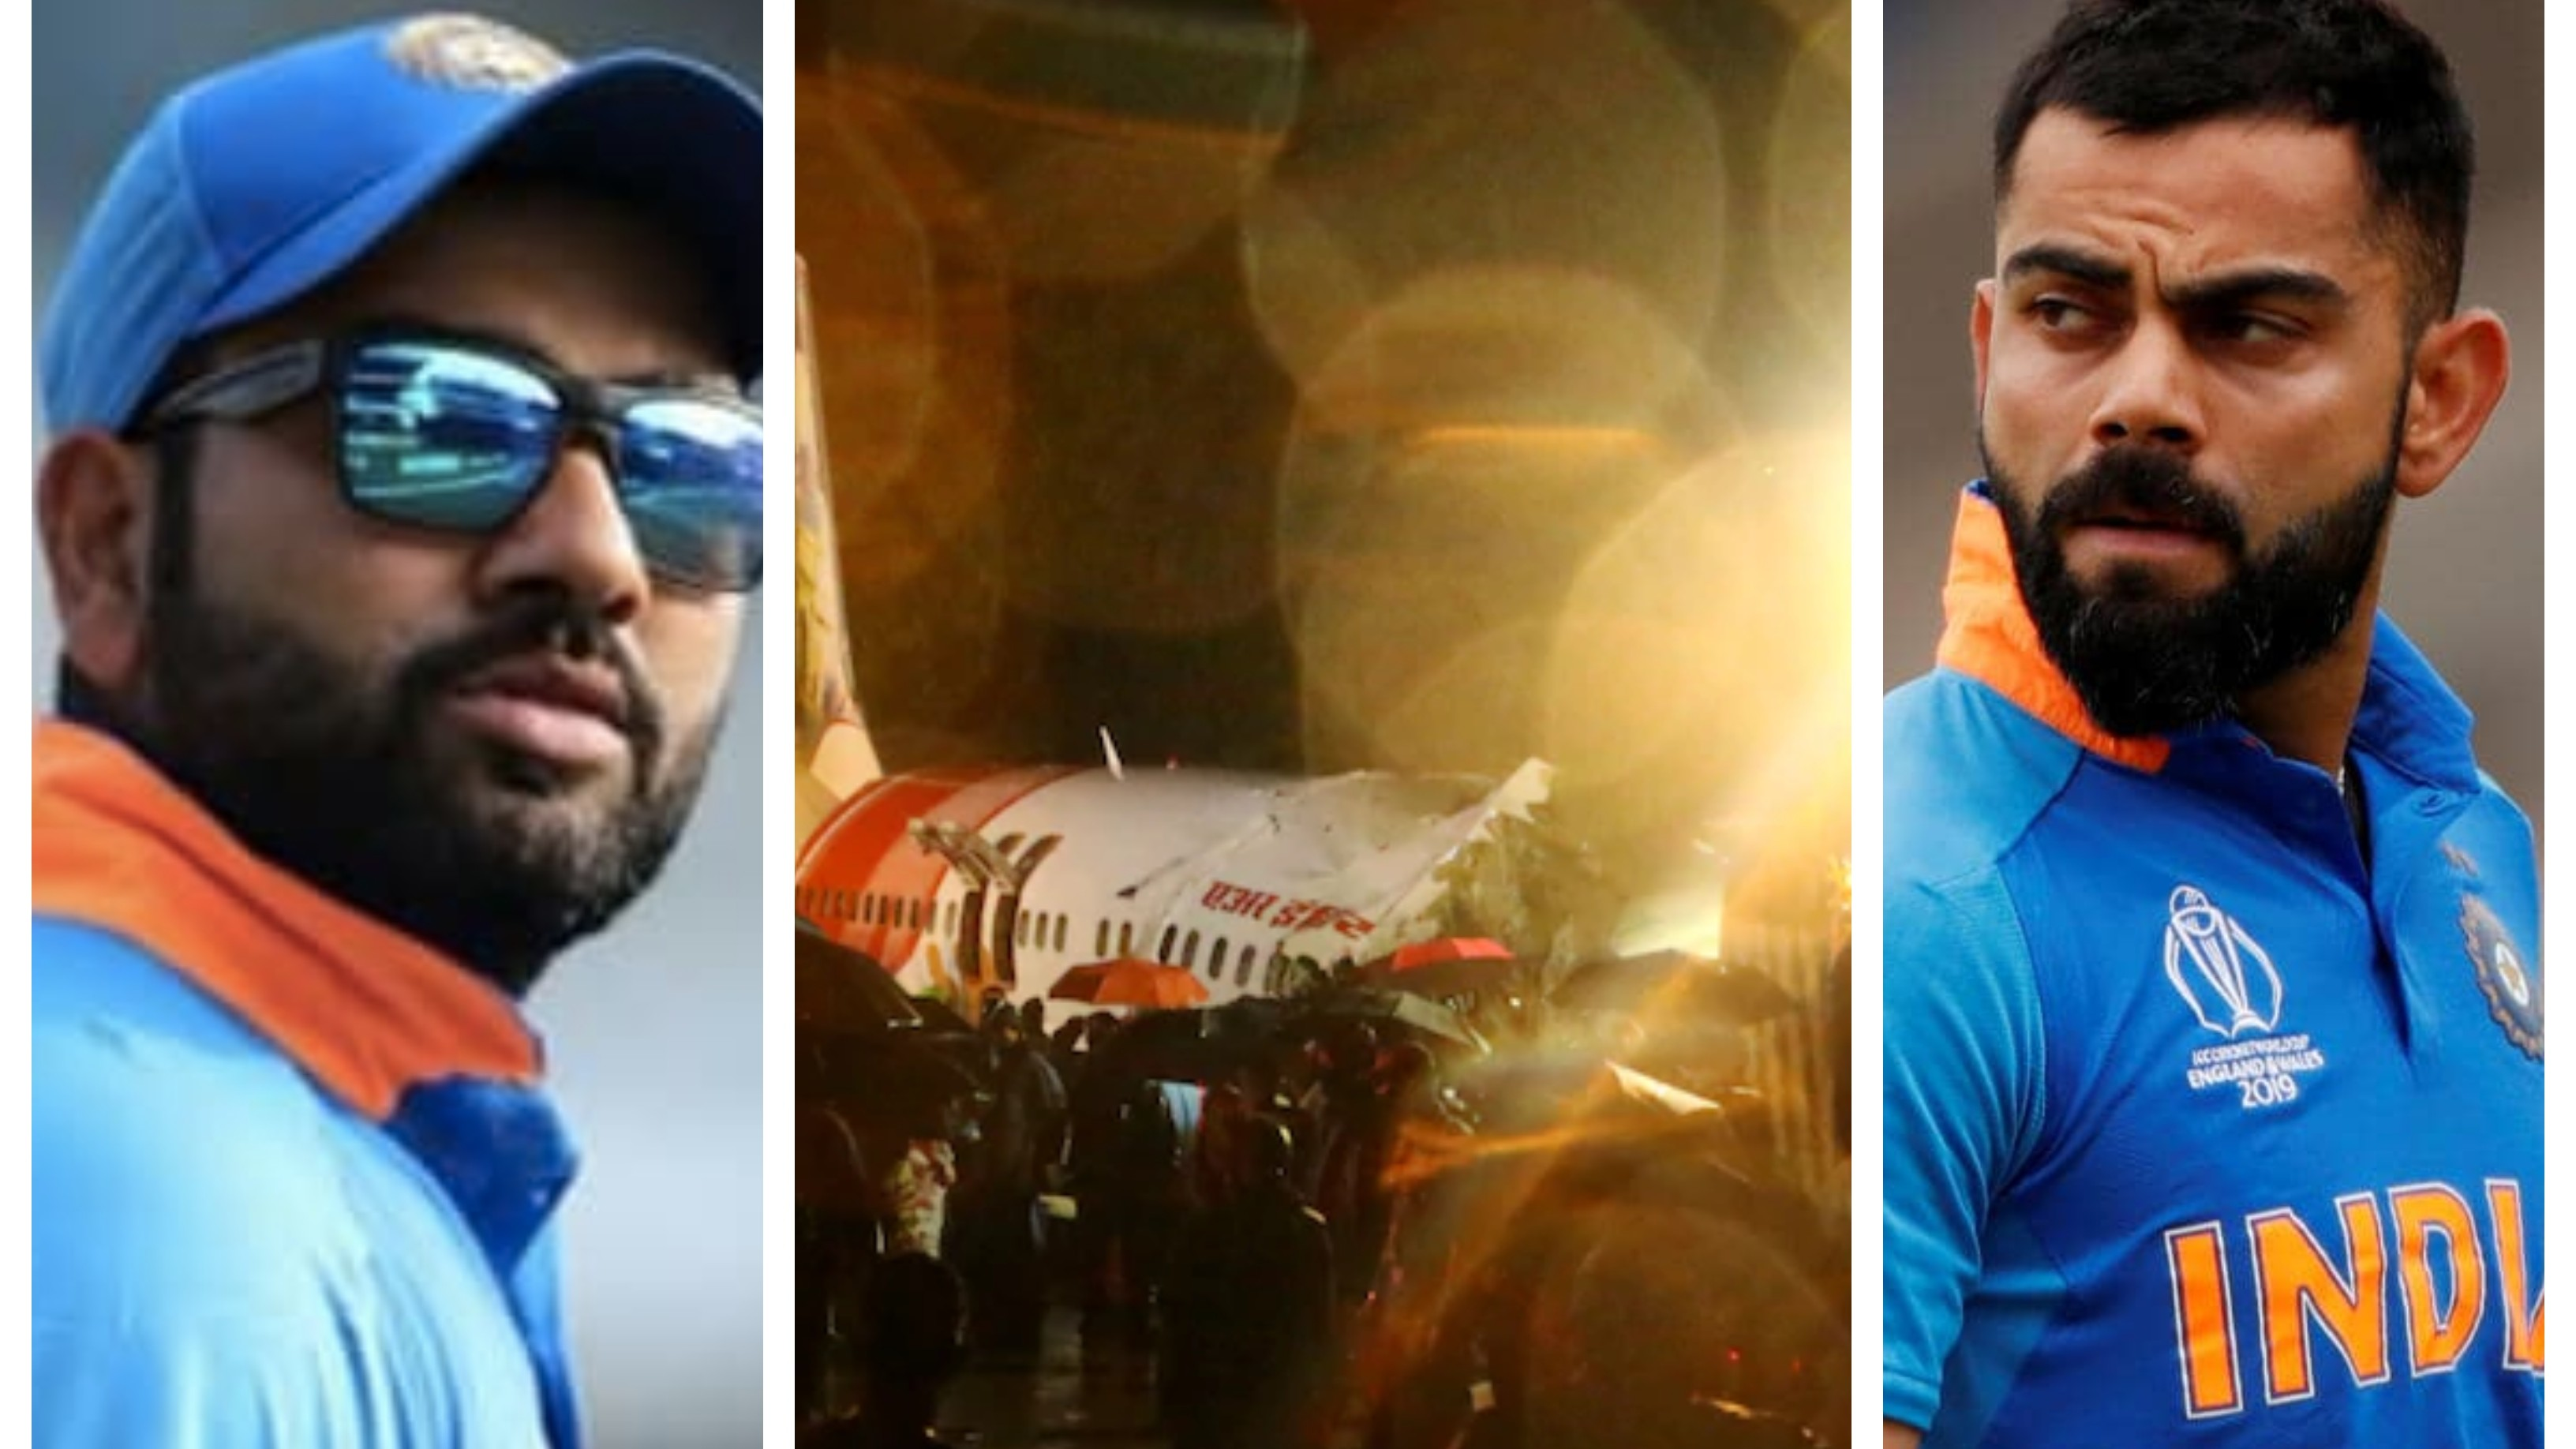 Air India Flight Crash: Indian cricketers express grief, offer condolences